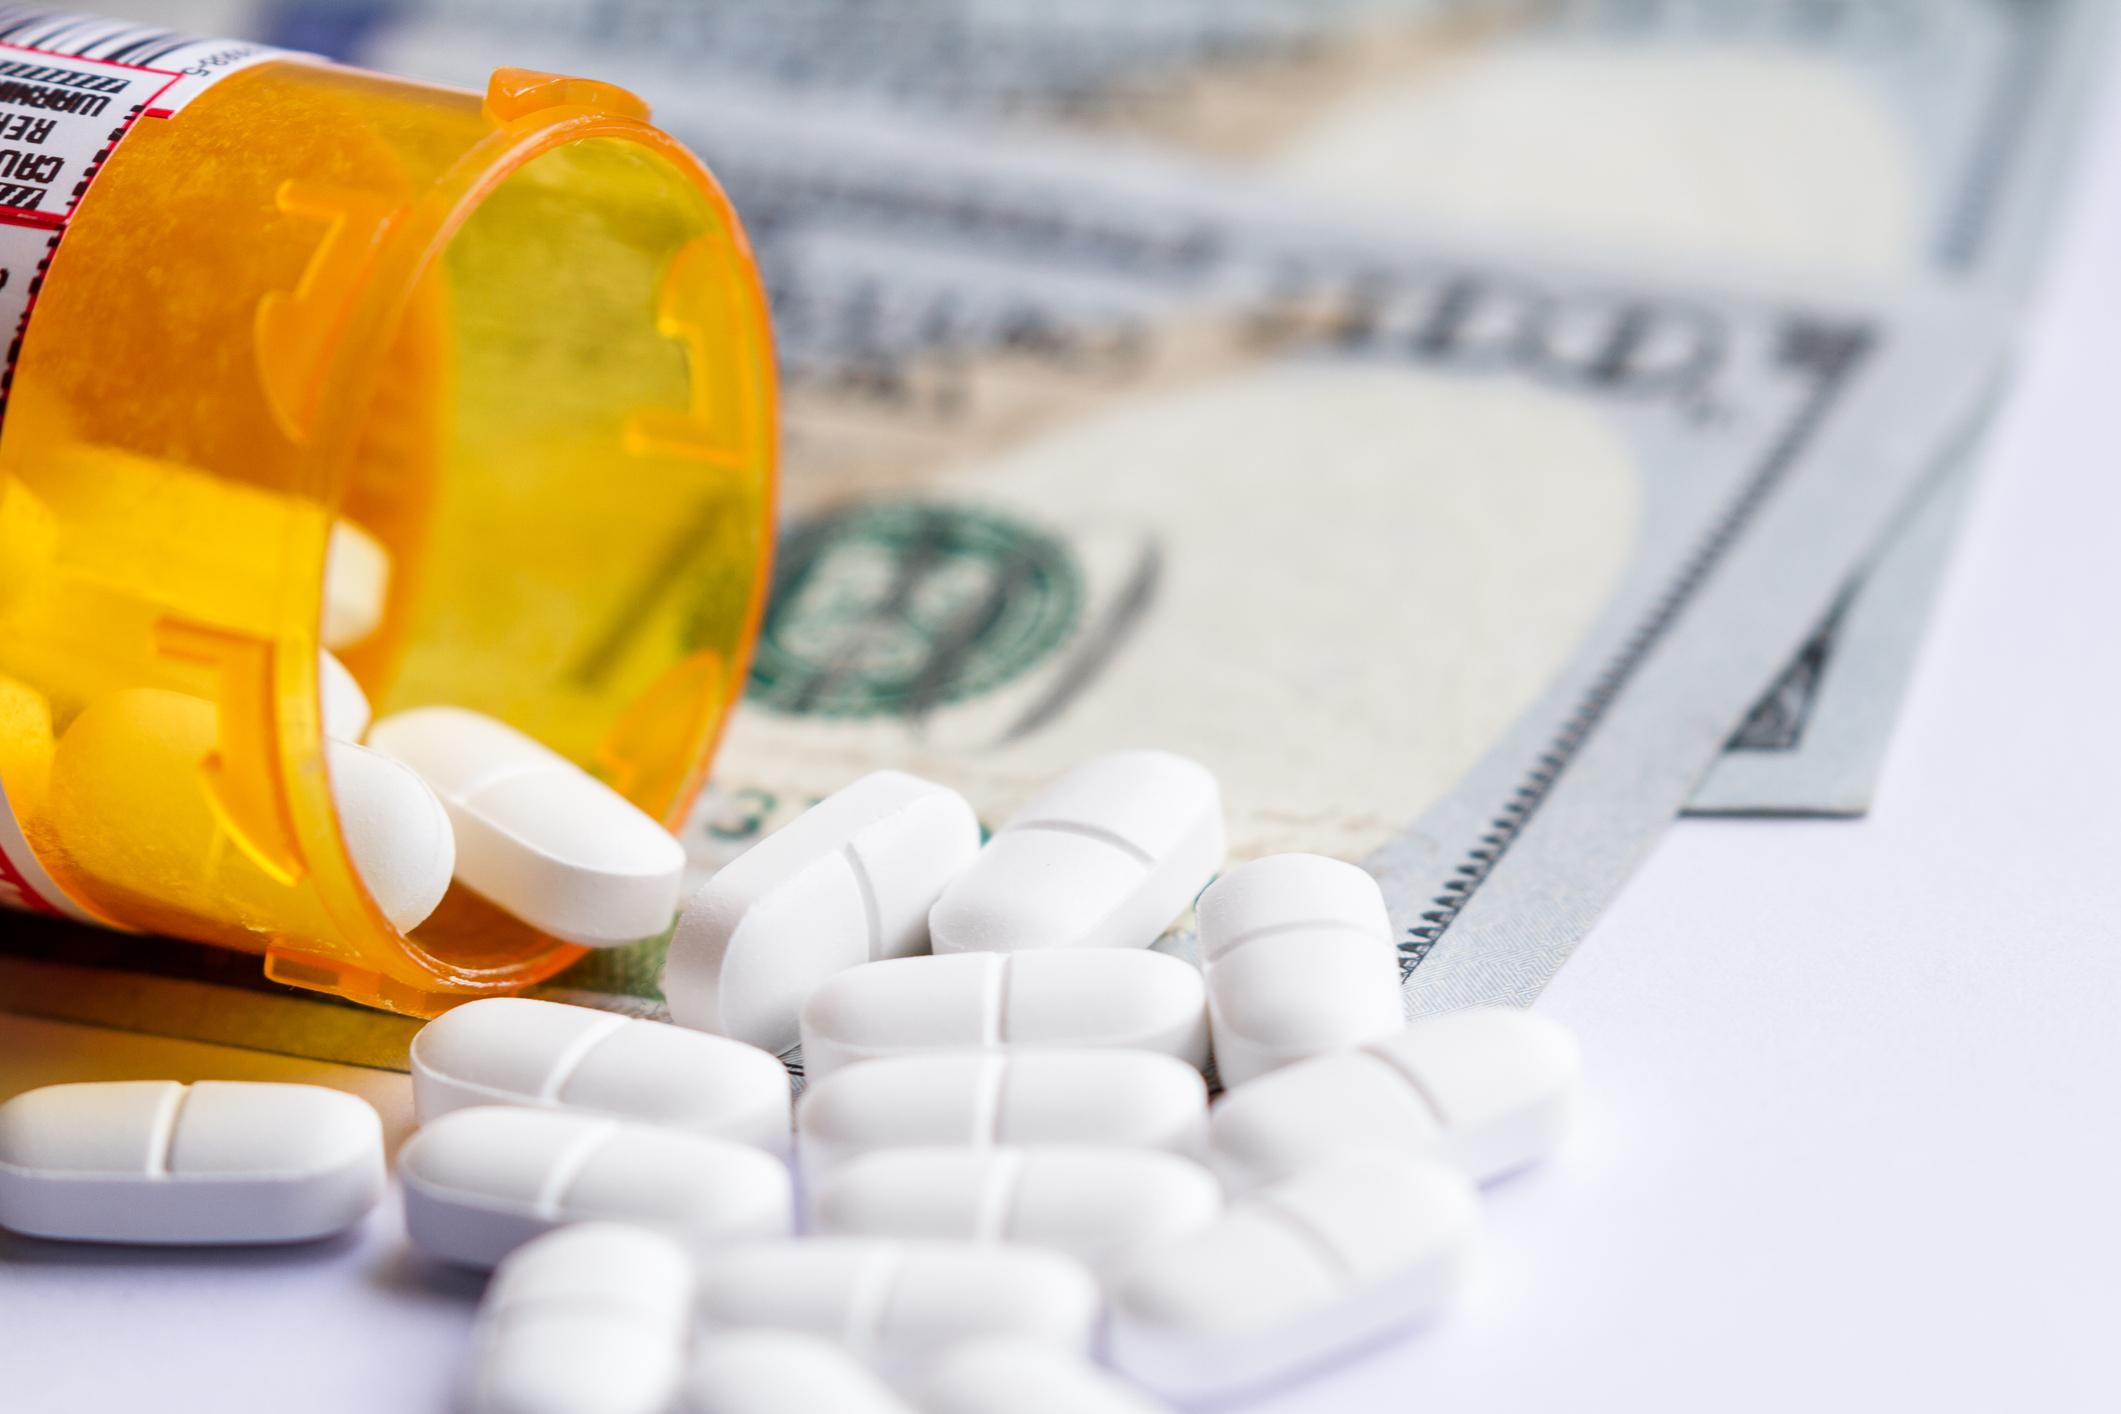 Prescription pills on money.